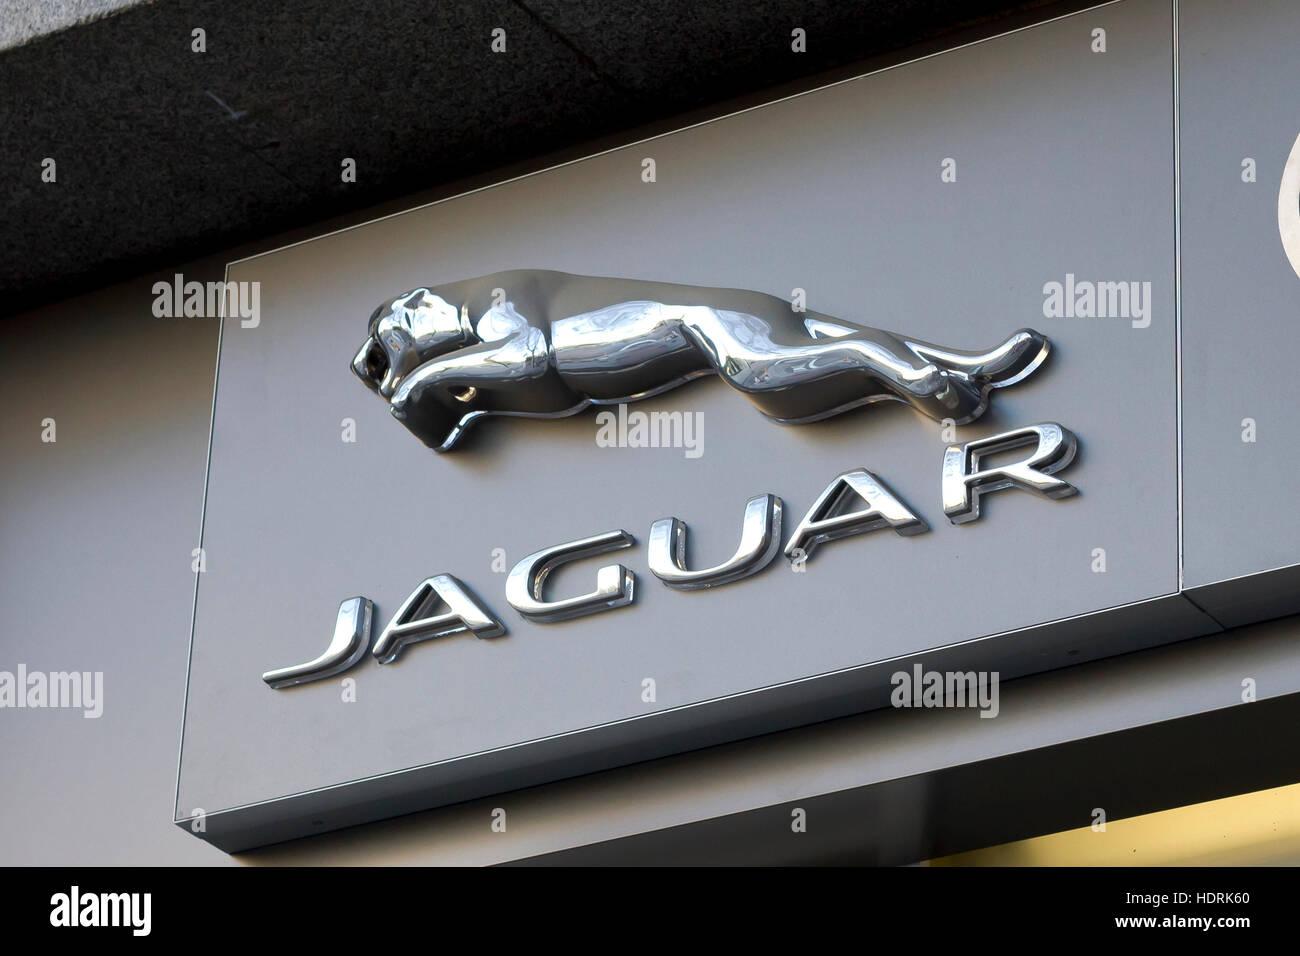 Jaguar car logo stock photos jaguar car logo stock images alamy famous car logo of jaguar car maker from car dealer in madrid stock image buycottarizona